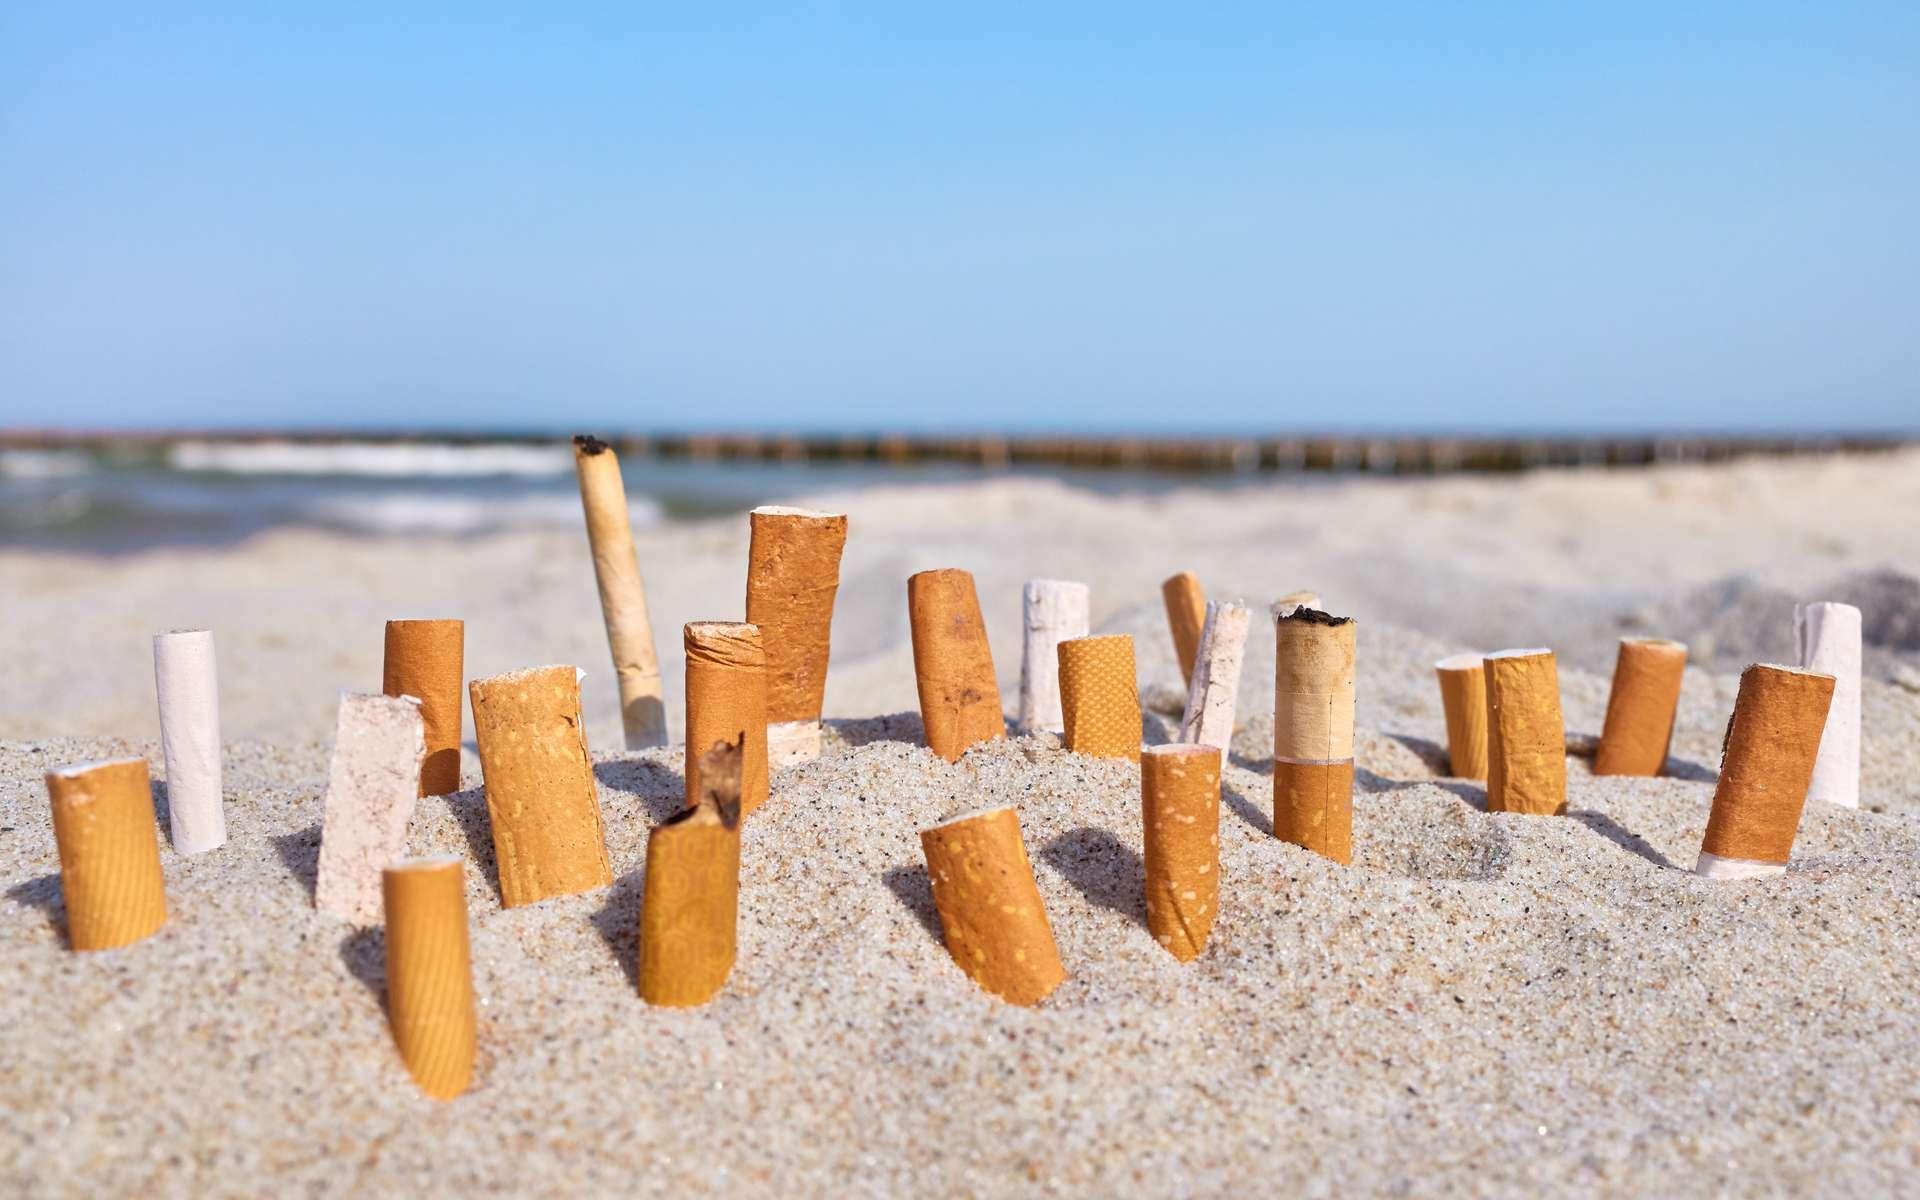 Quel est l'impact des mégots sur le milieu marin ? © MaciejBledowski, Adobe Stock